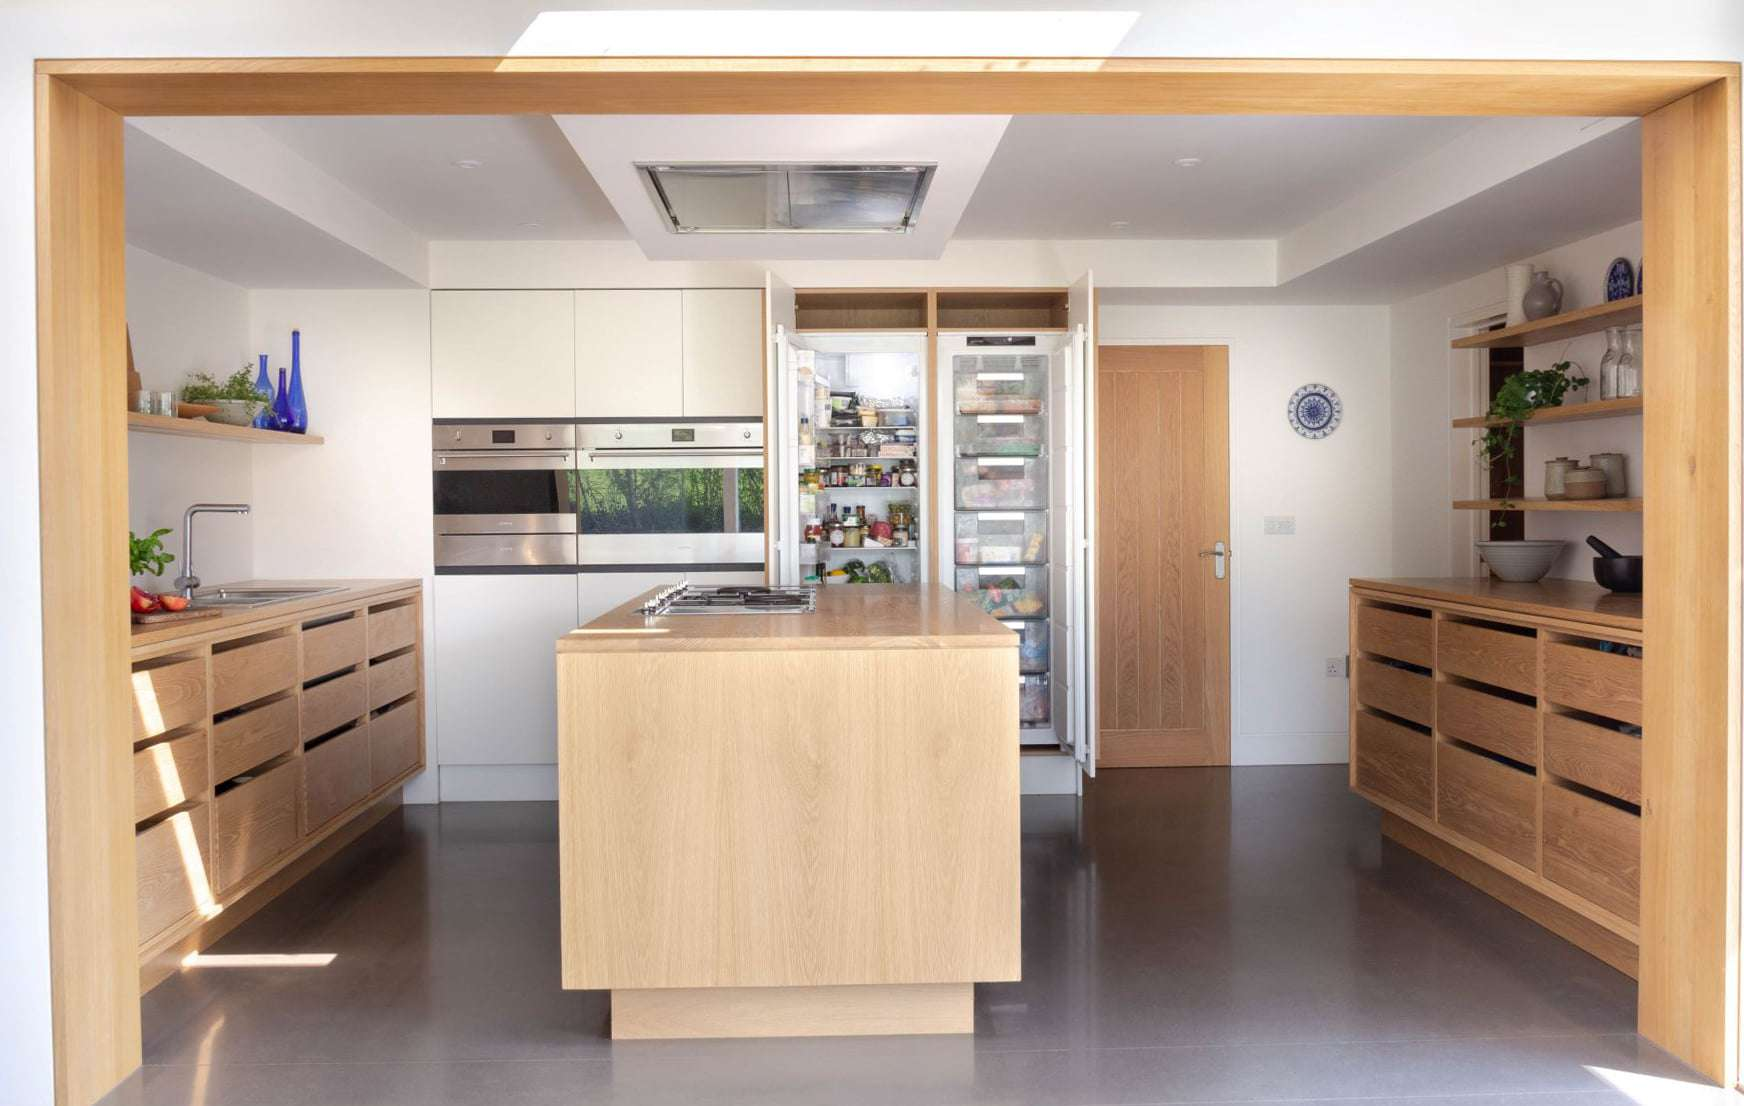 concrete floor in kitchen